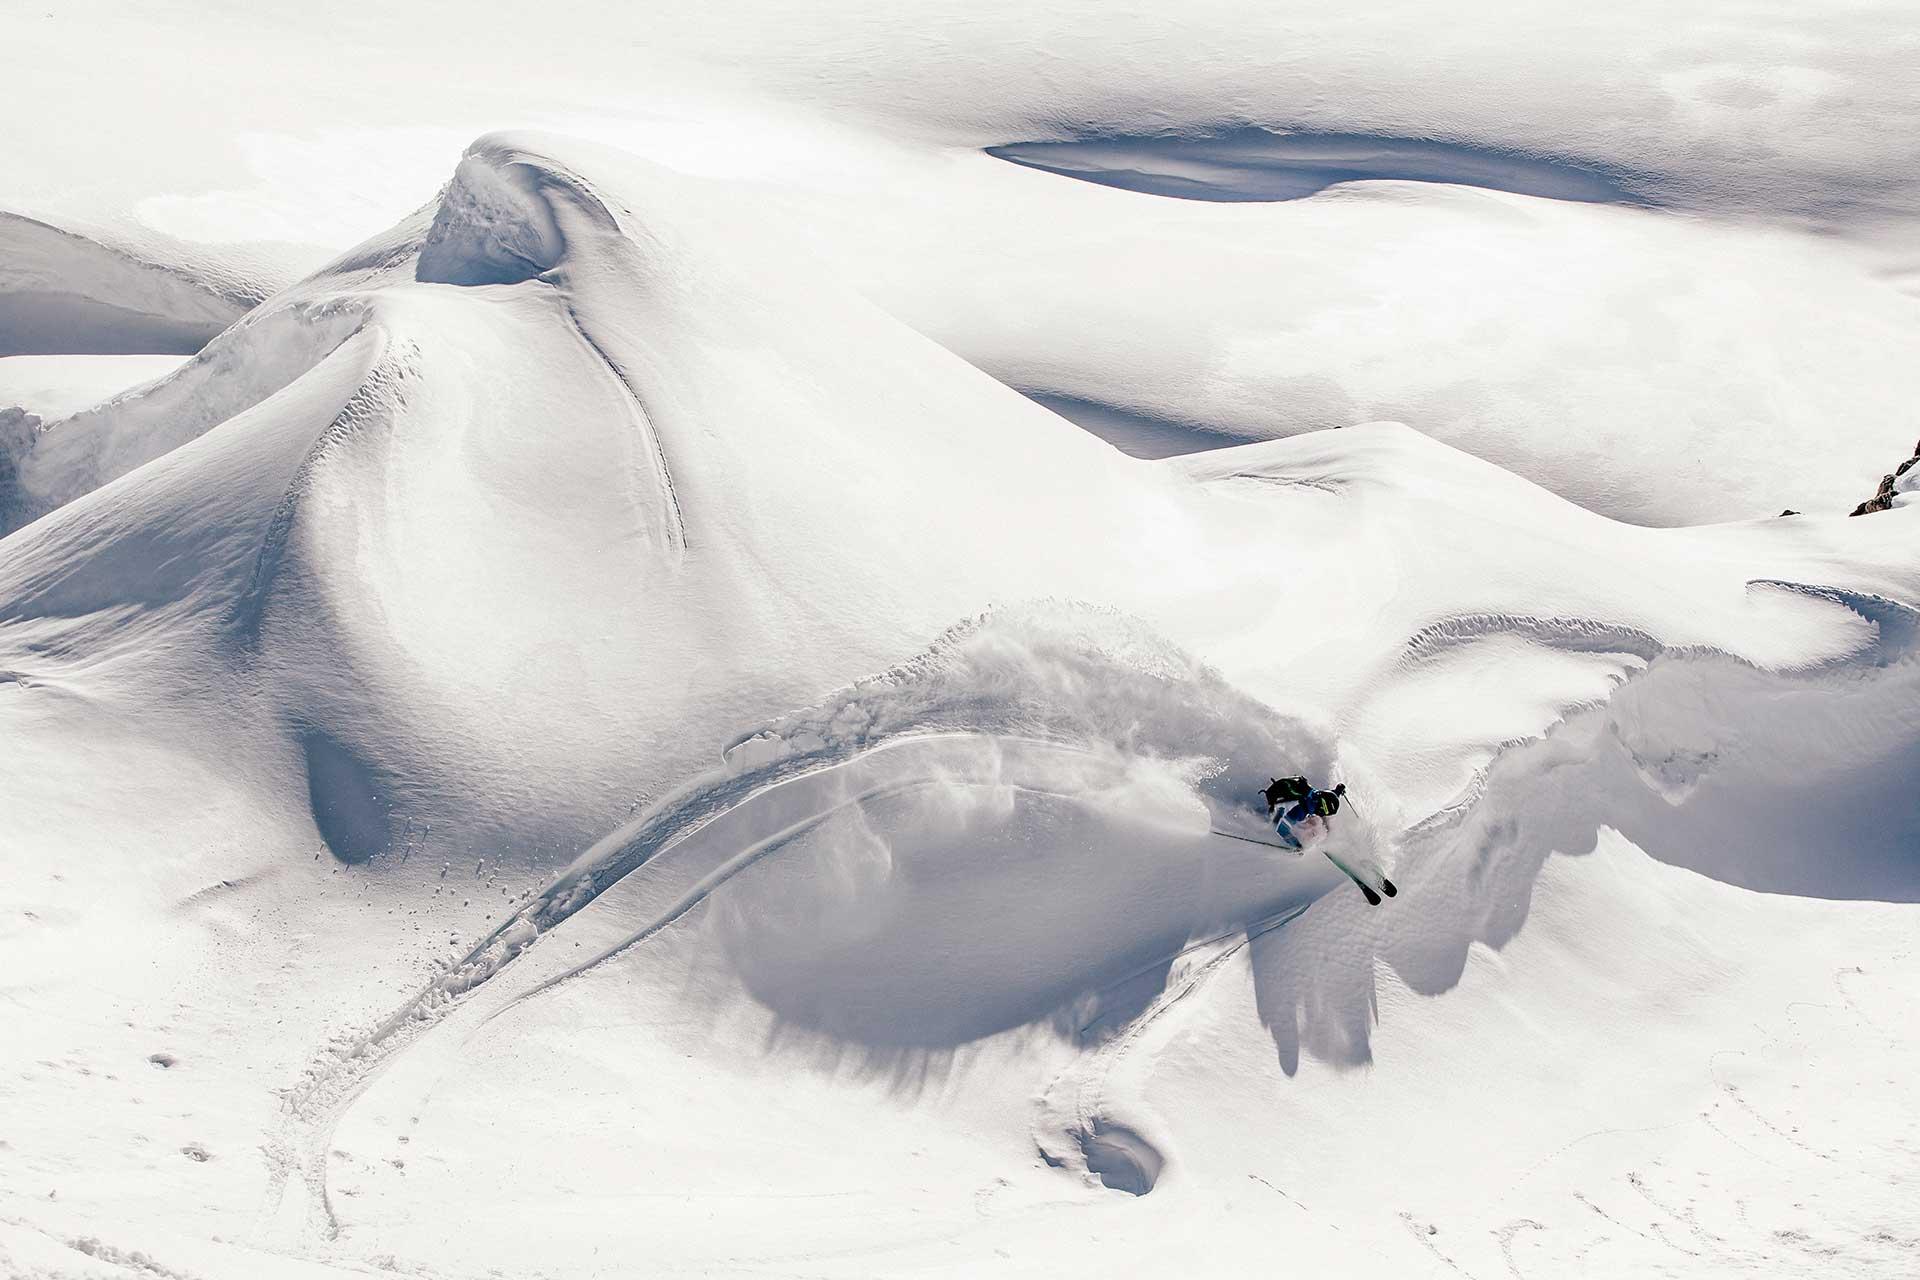 Fotograf Tiefschnee Wintersport Aktion Ski Hamburg Sportfotograf